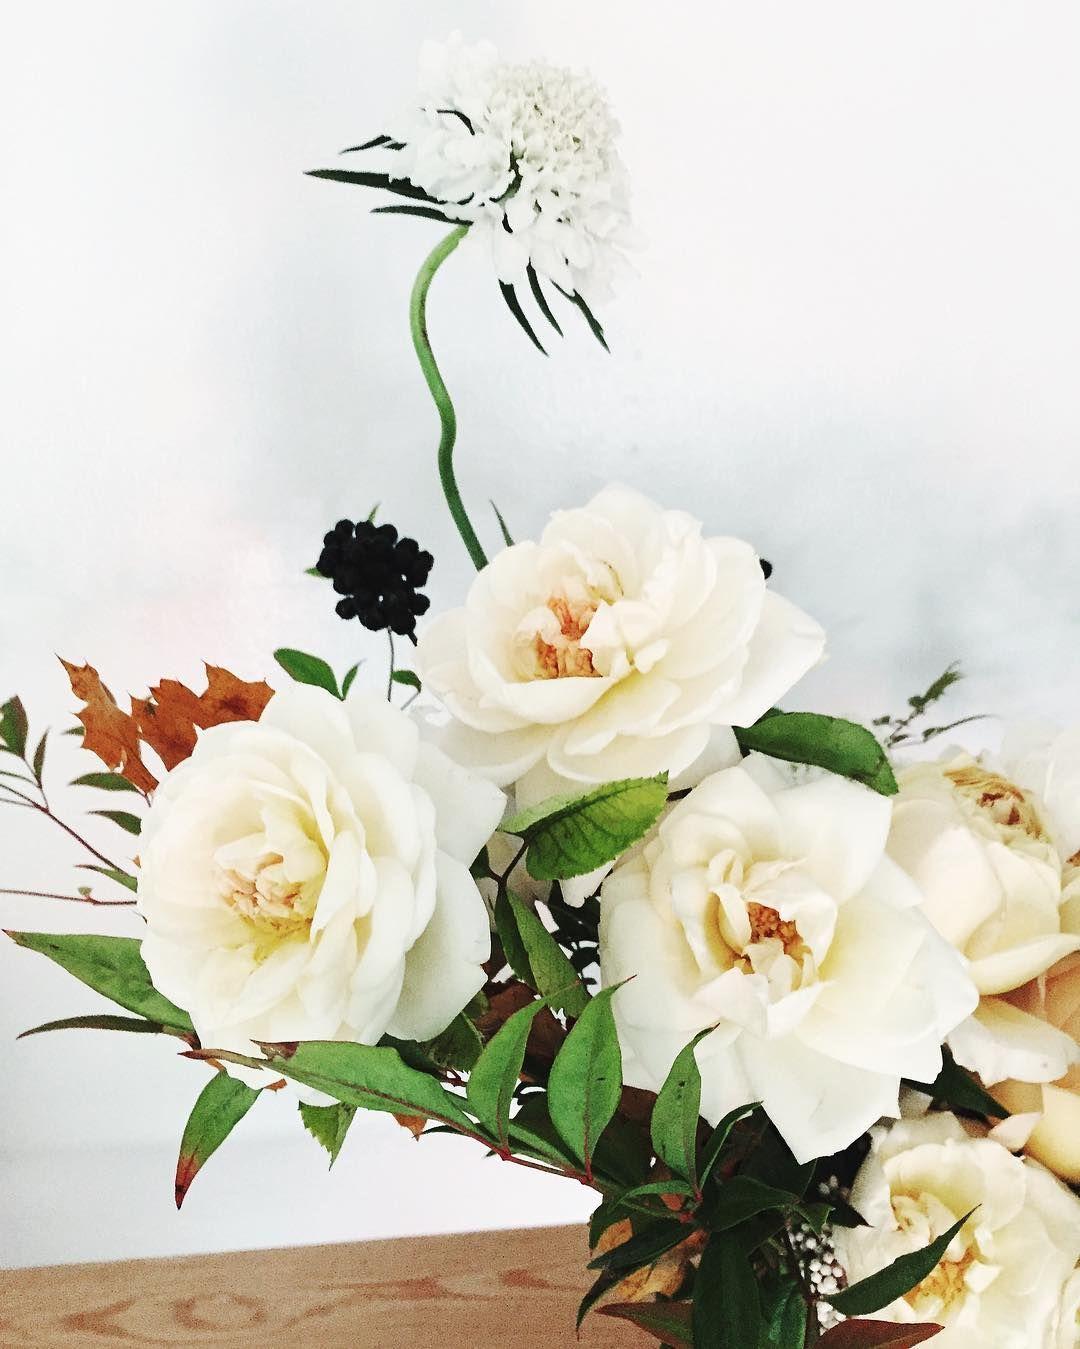 Creamy details   #wildgreenyonder #gardenroses #scabiosa #fallflowers #viburnum #bouquet #florist